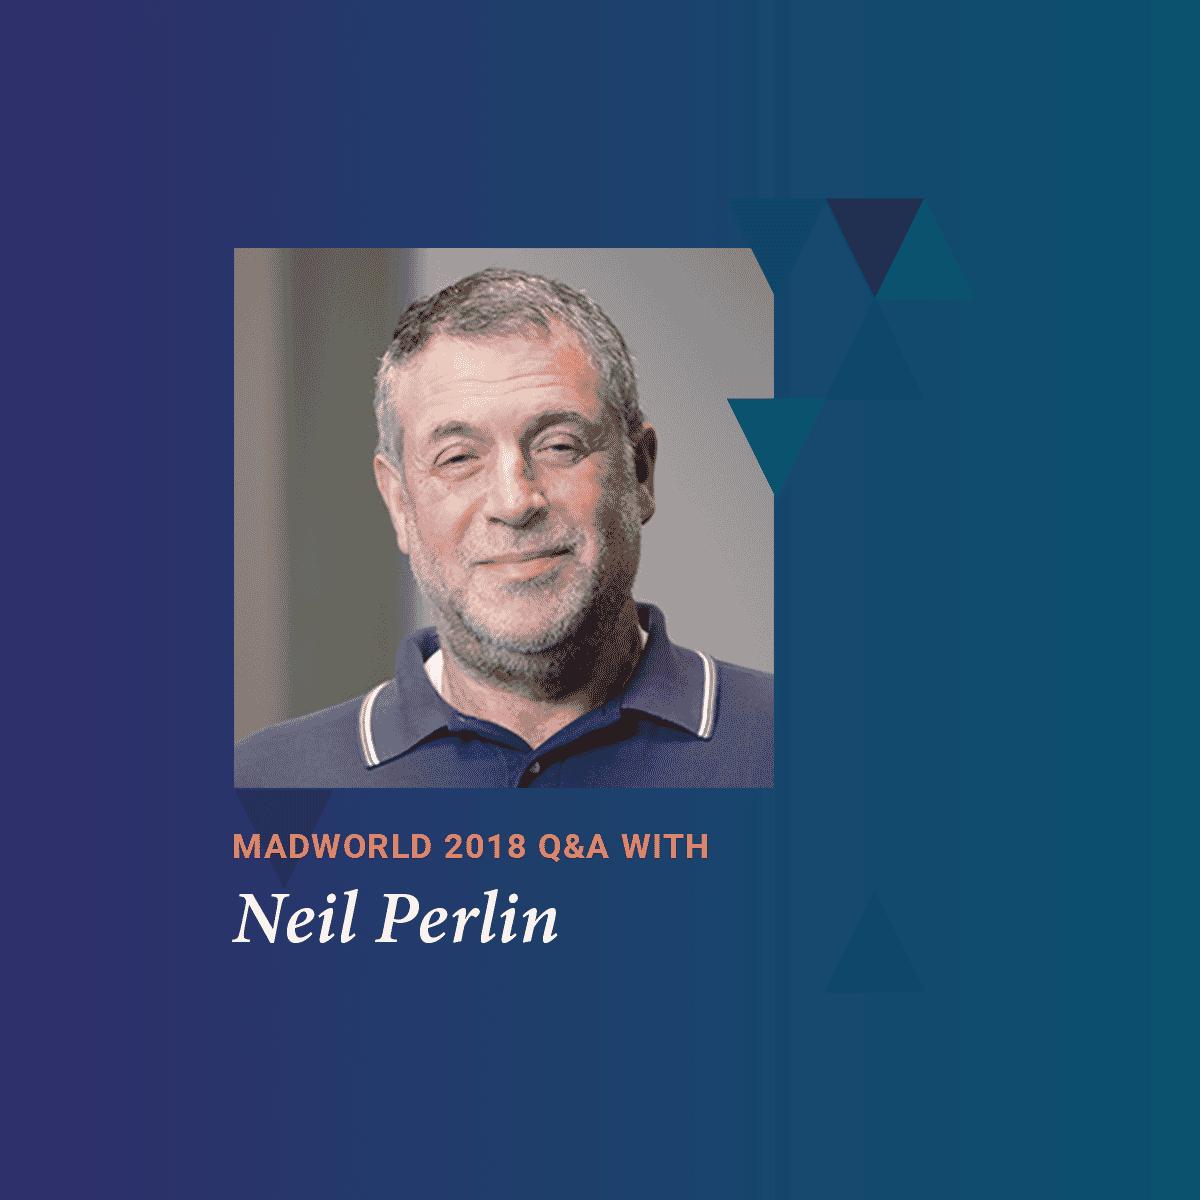 MadWorld 2018 San Diego Speaker Neil Perlin